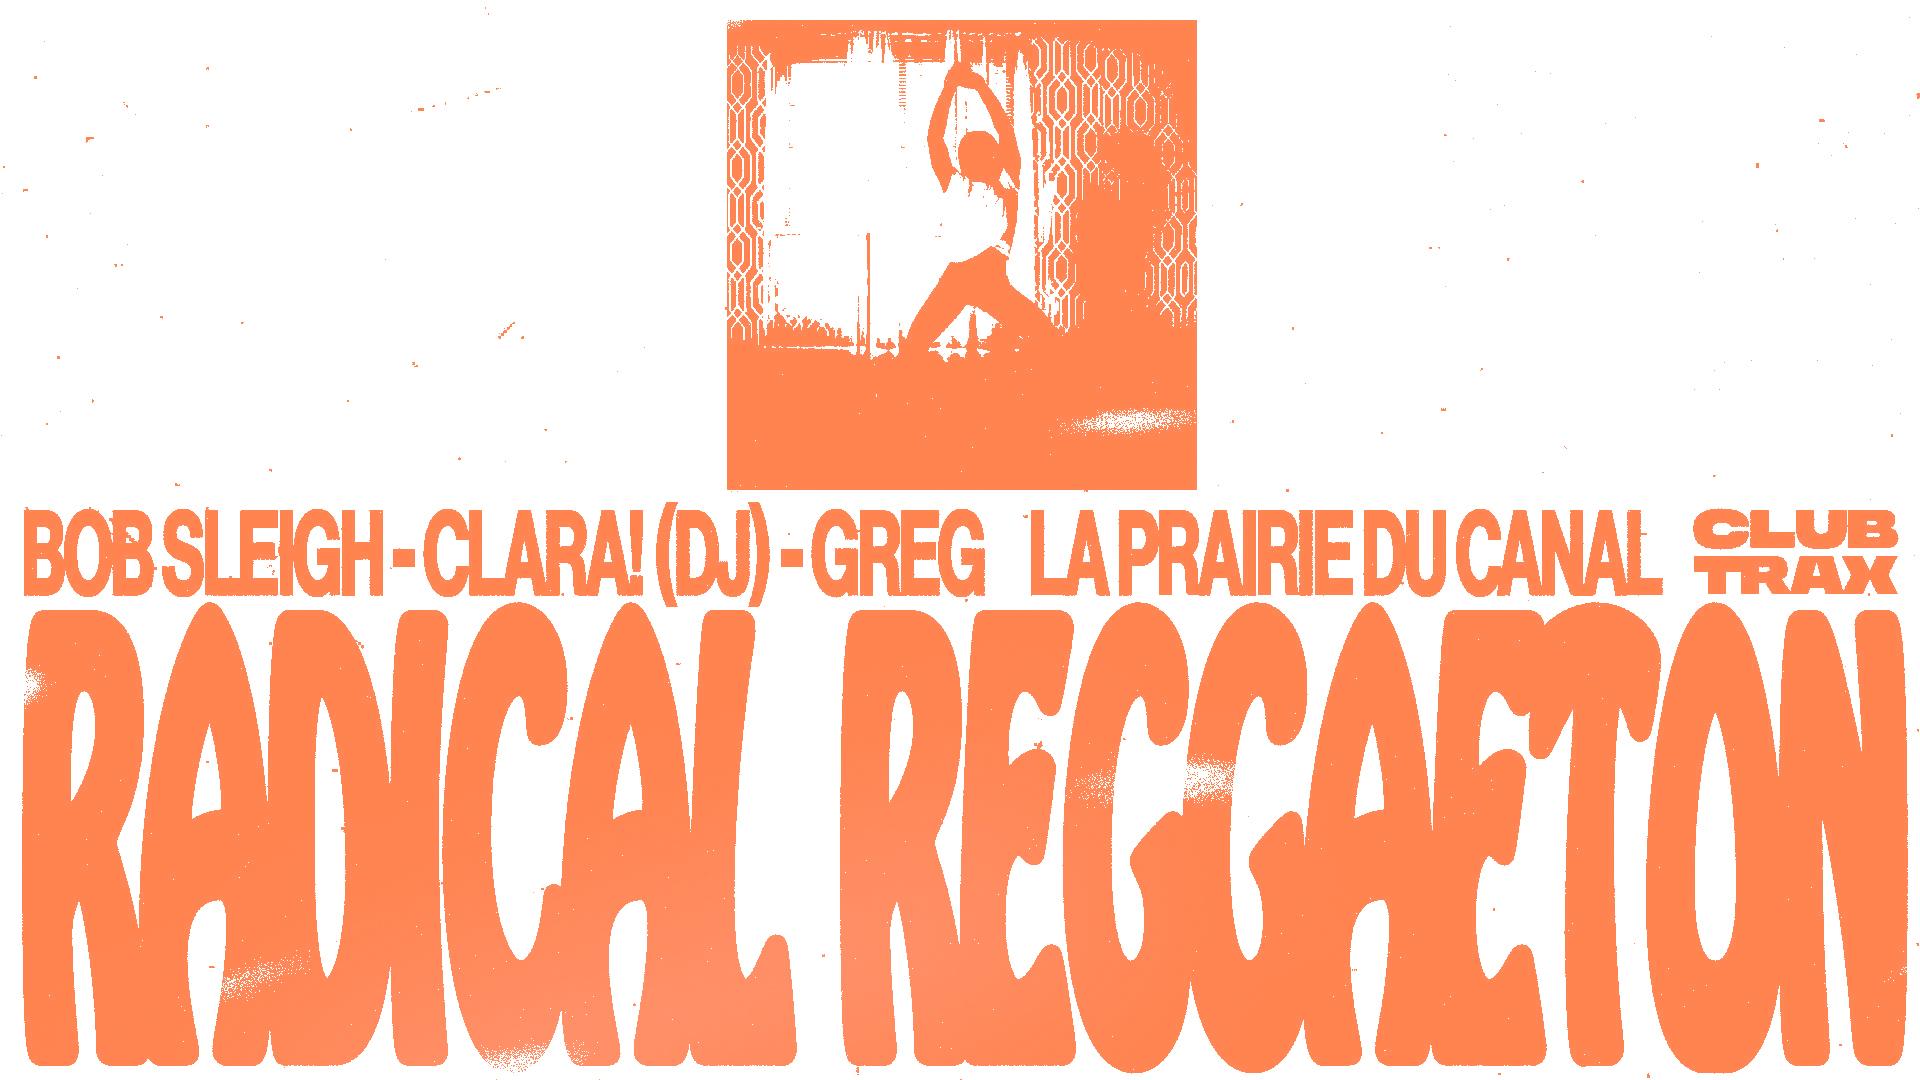 Club Trax x La Prairie du Canal : Radical Reggaeton